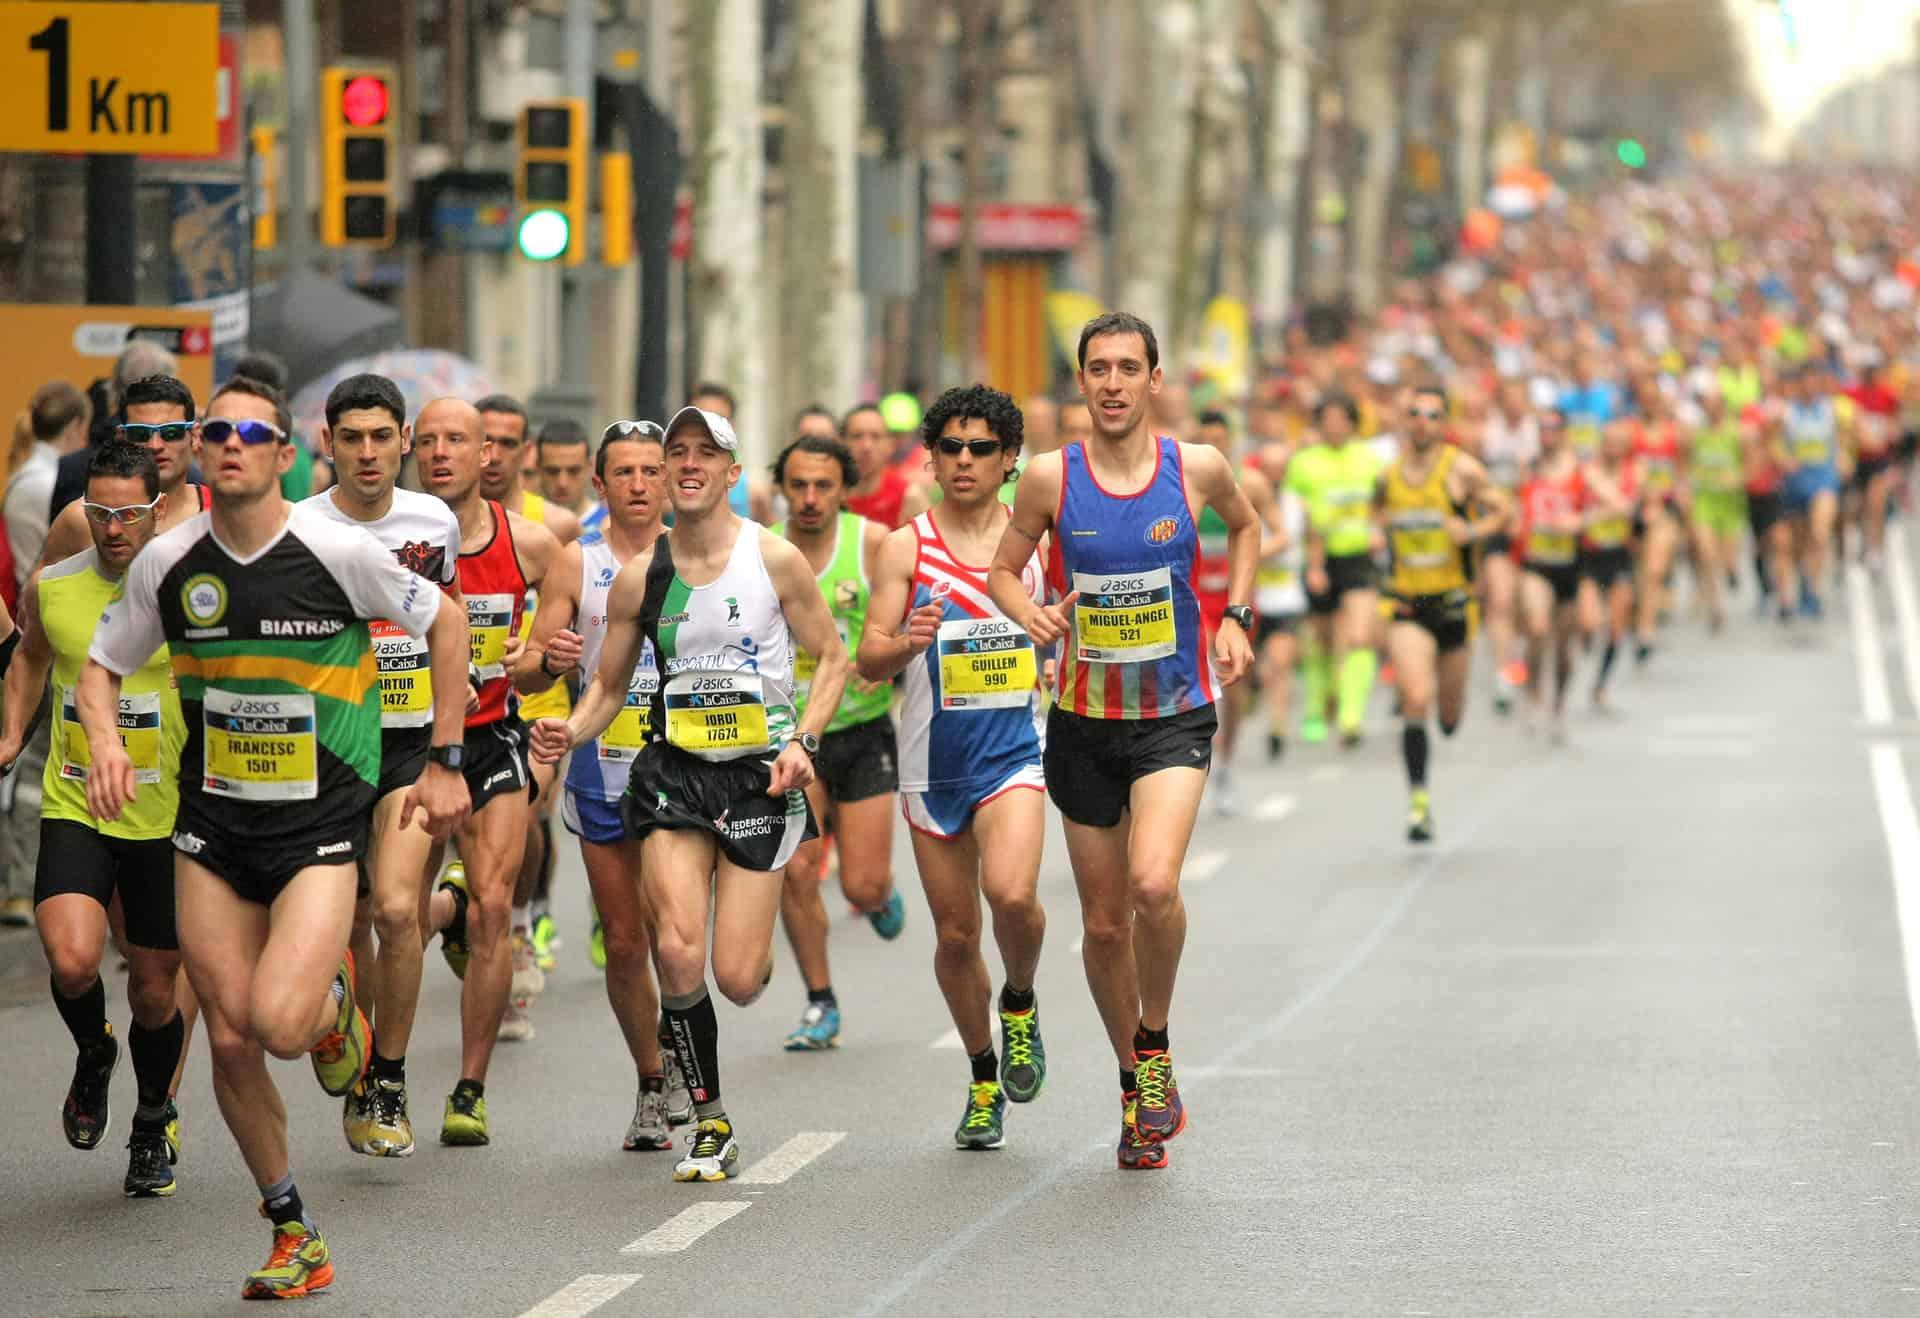 Barcelona In March - The Barcelona Marathon